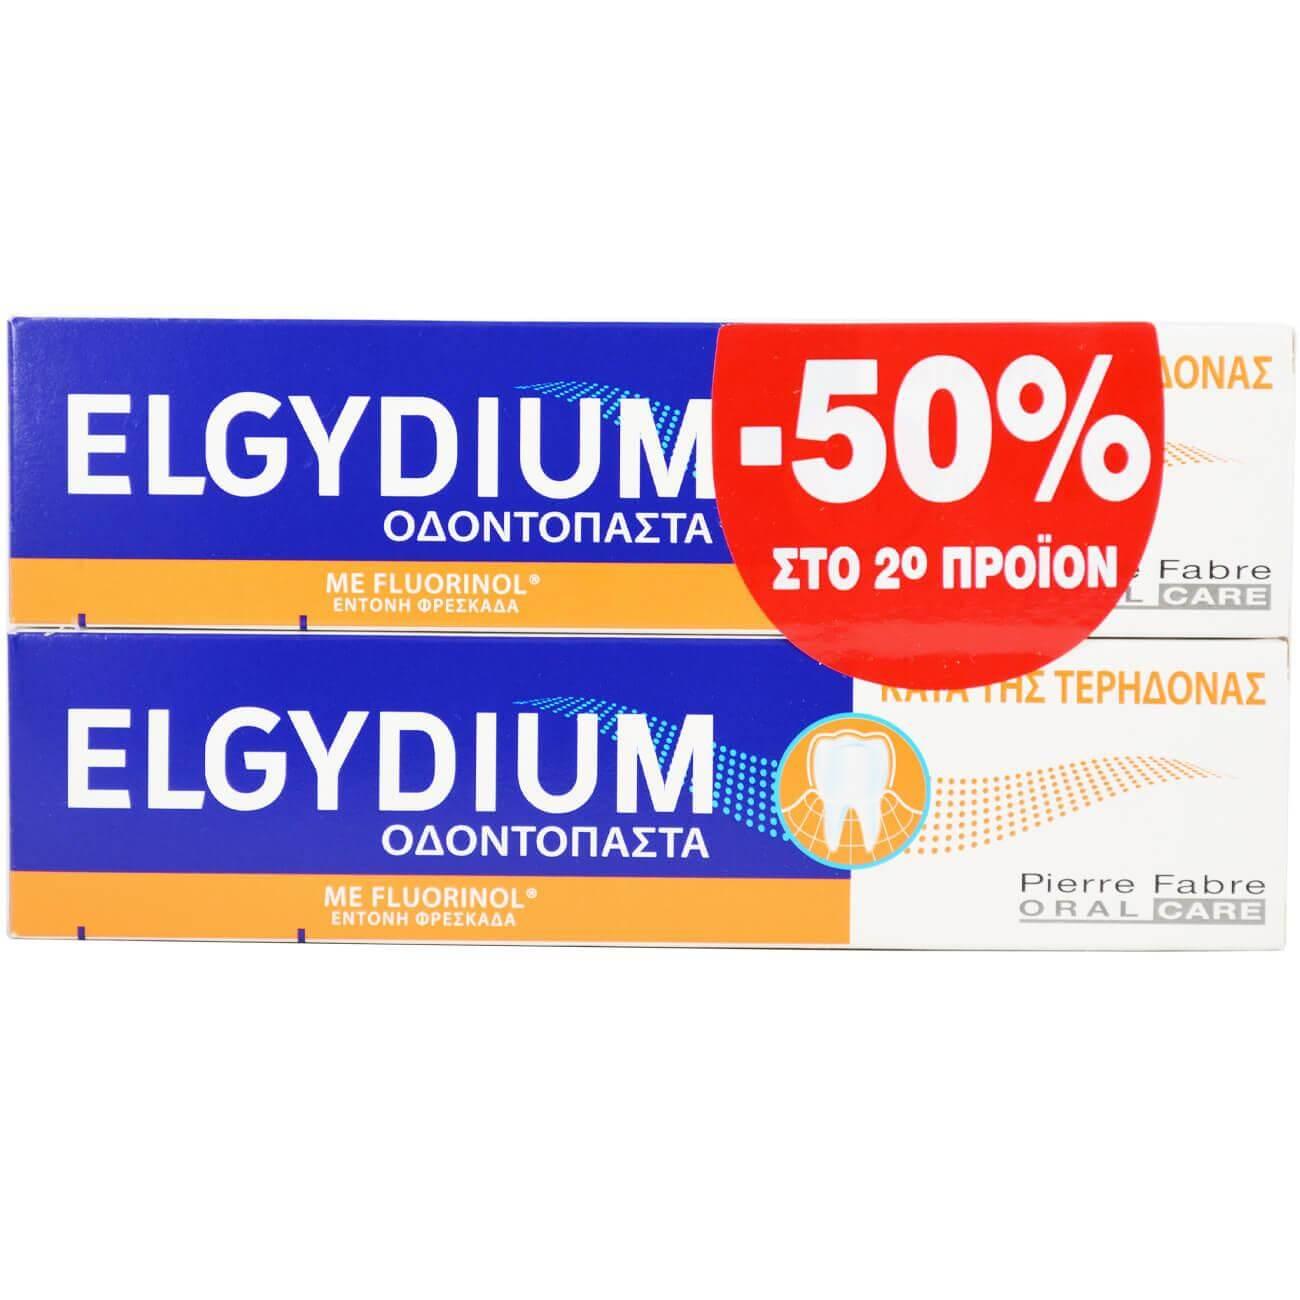 ElgydiumΟδοντόπασταΚατά της Τερηδόνας με Fluorinol για Έντονη Φρεσκάδα Promo -50% στο 2ο Προϊόν